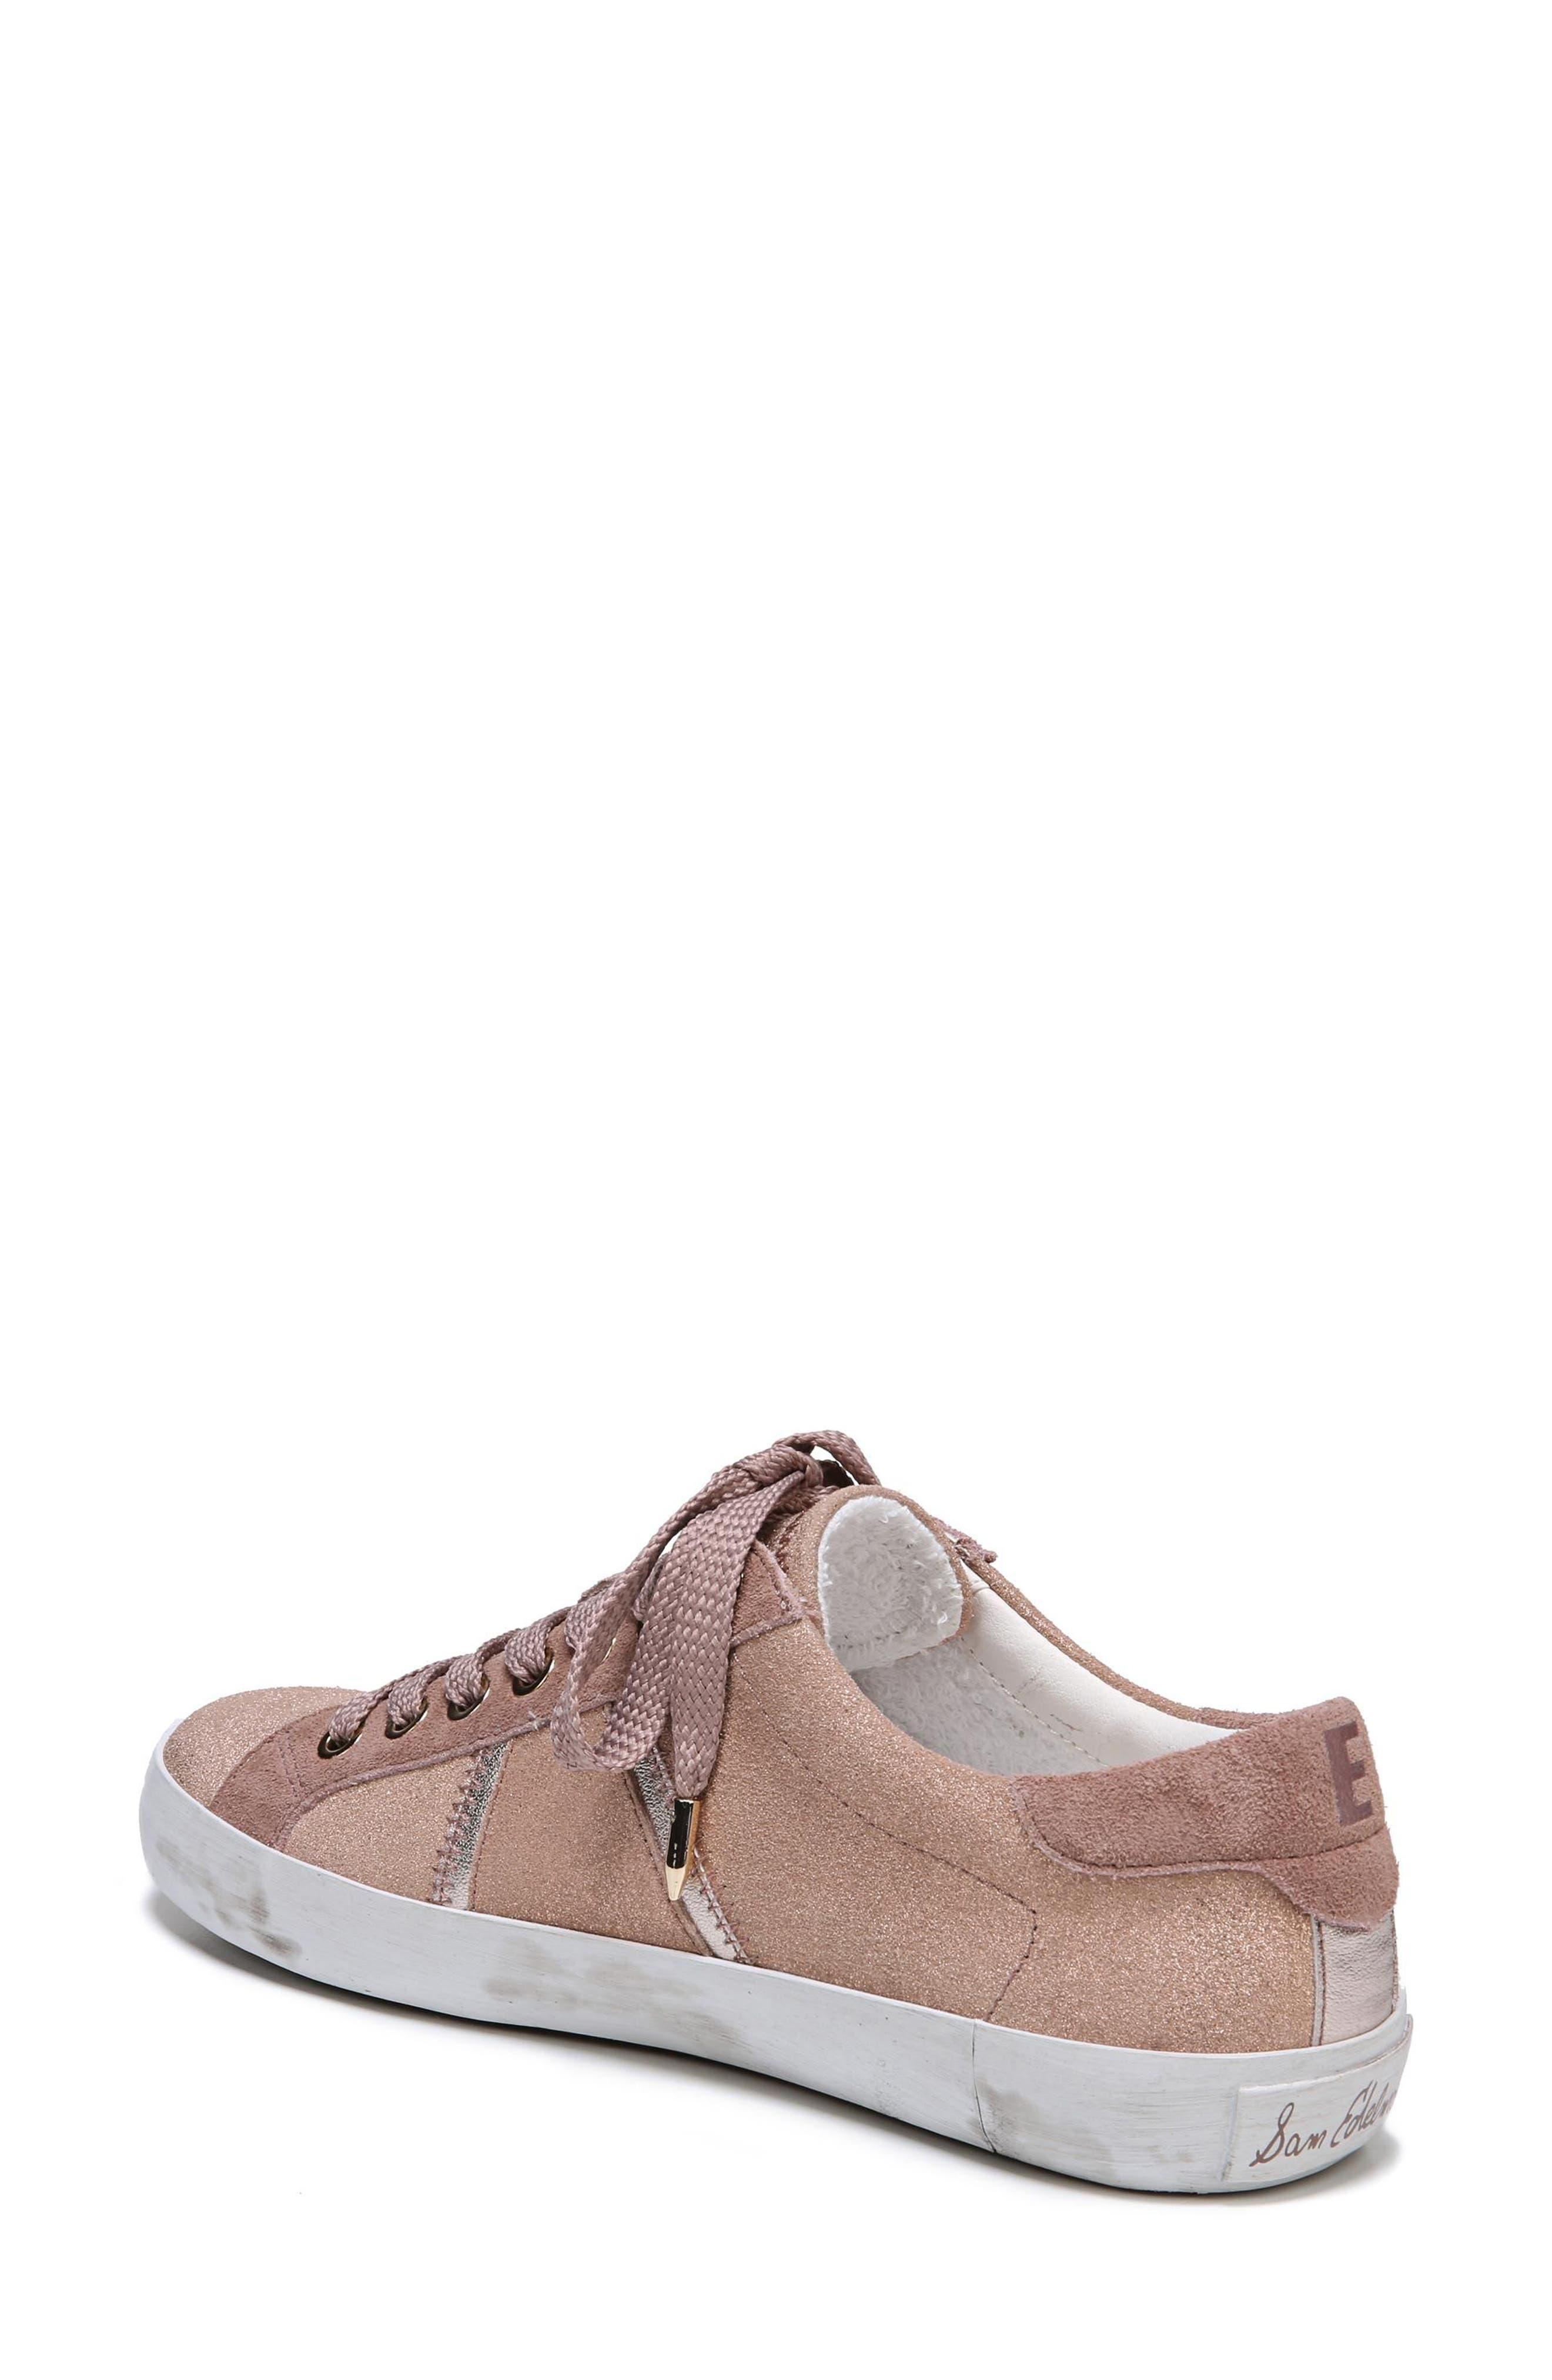 Baylee Sneaker,                             Alternate thumbnail 2, color,